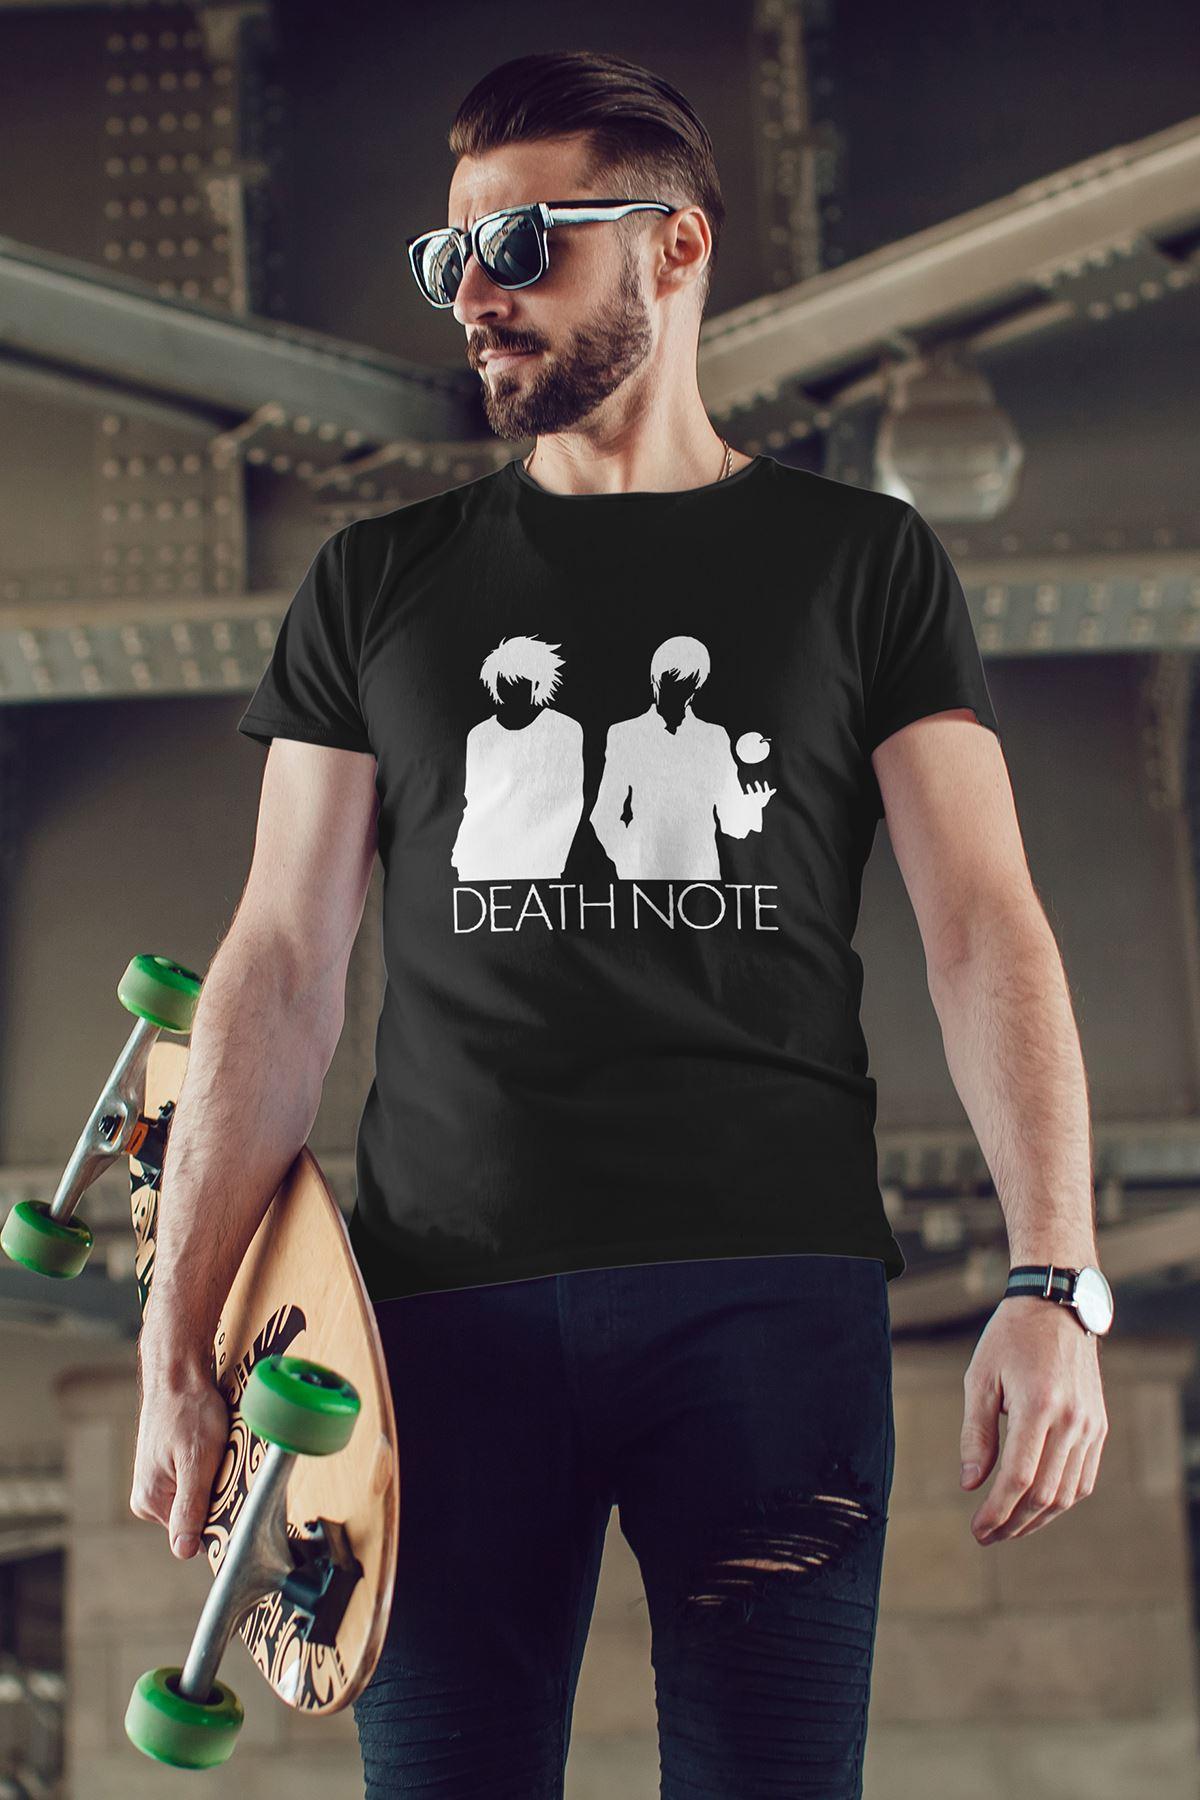 Anime Death Note 07 Siyah Erkek Tshirt - Tişört